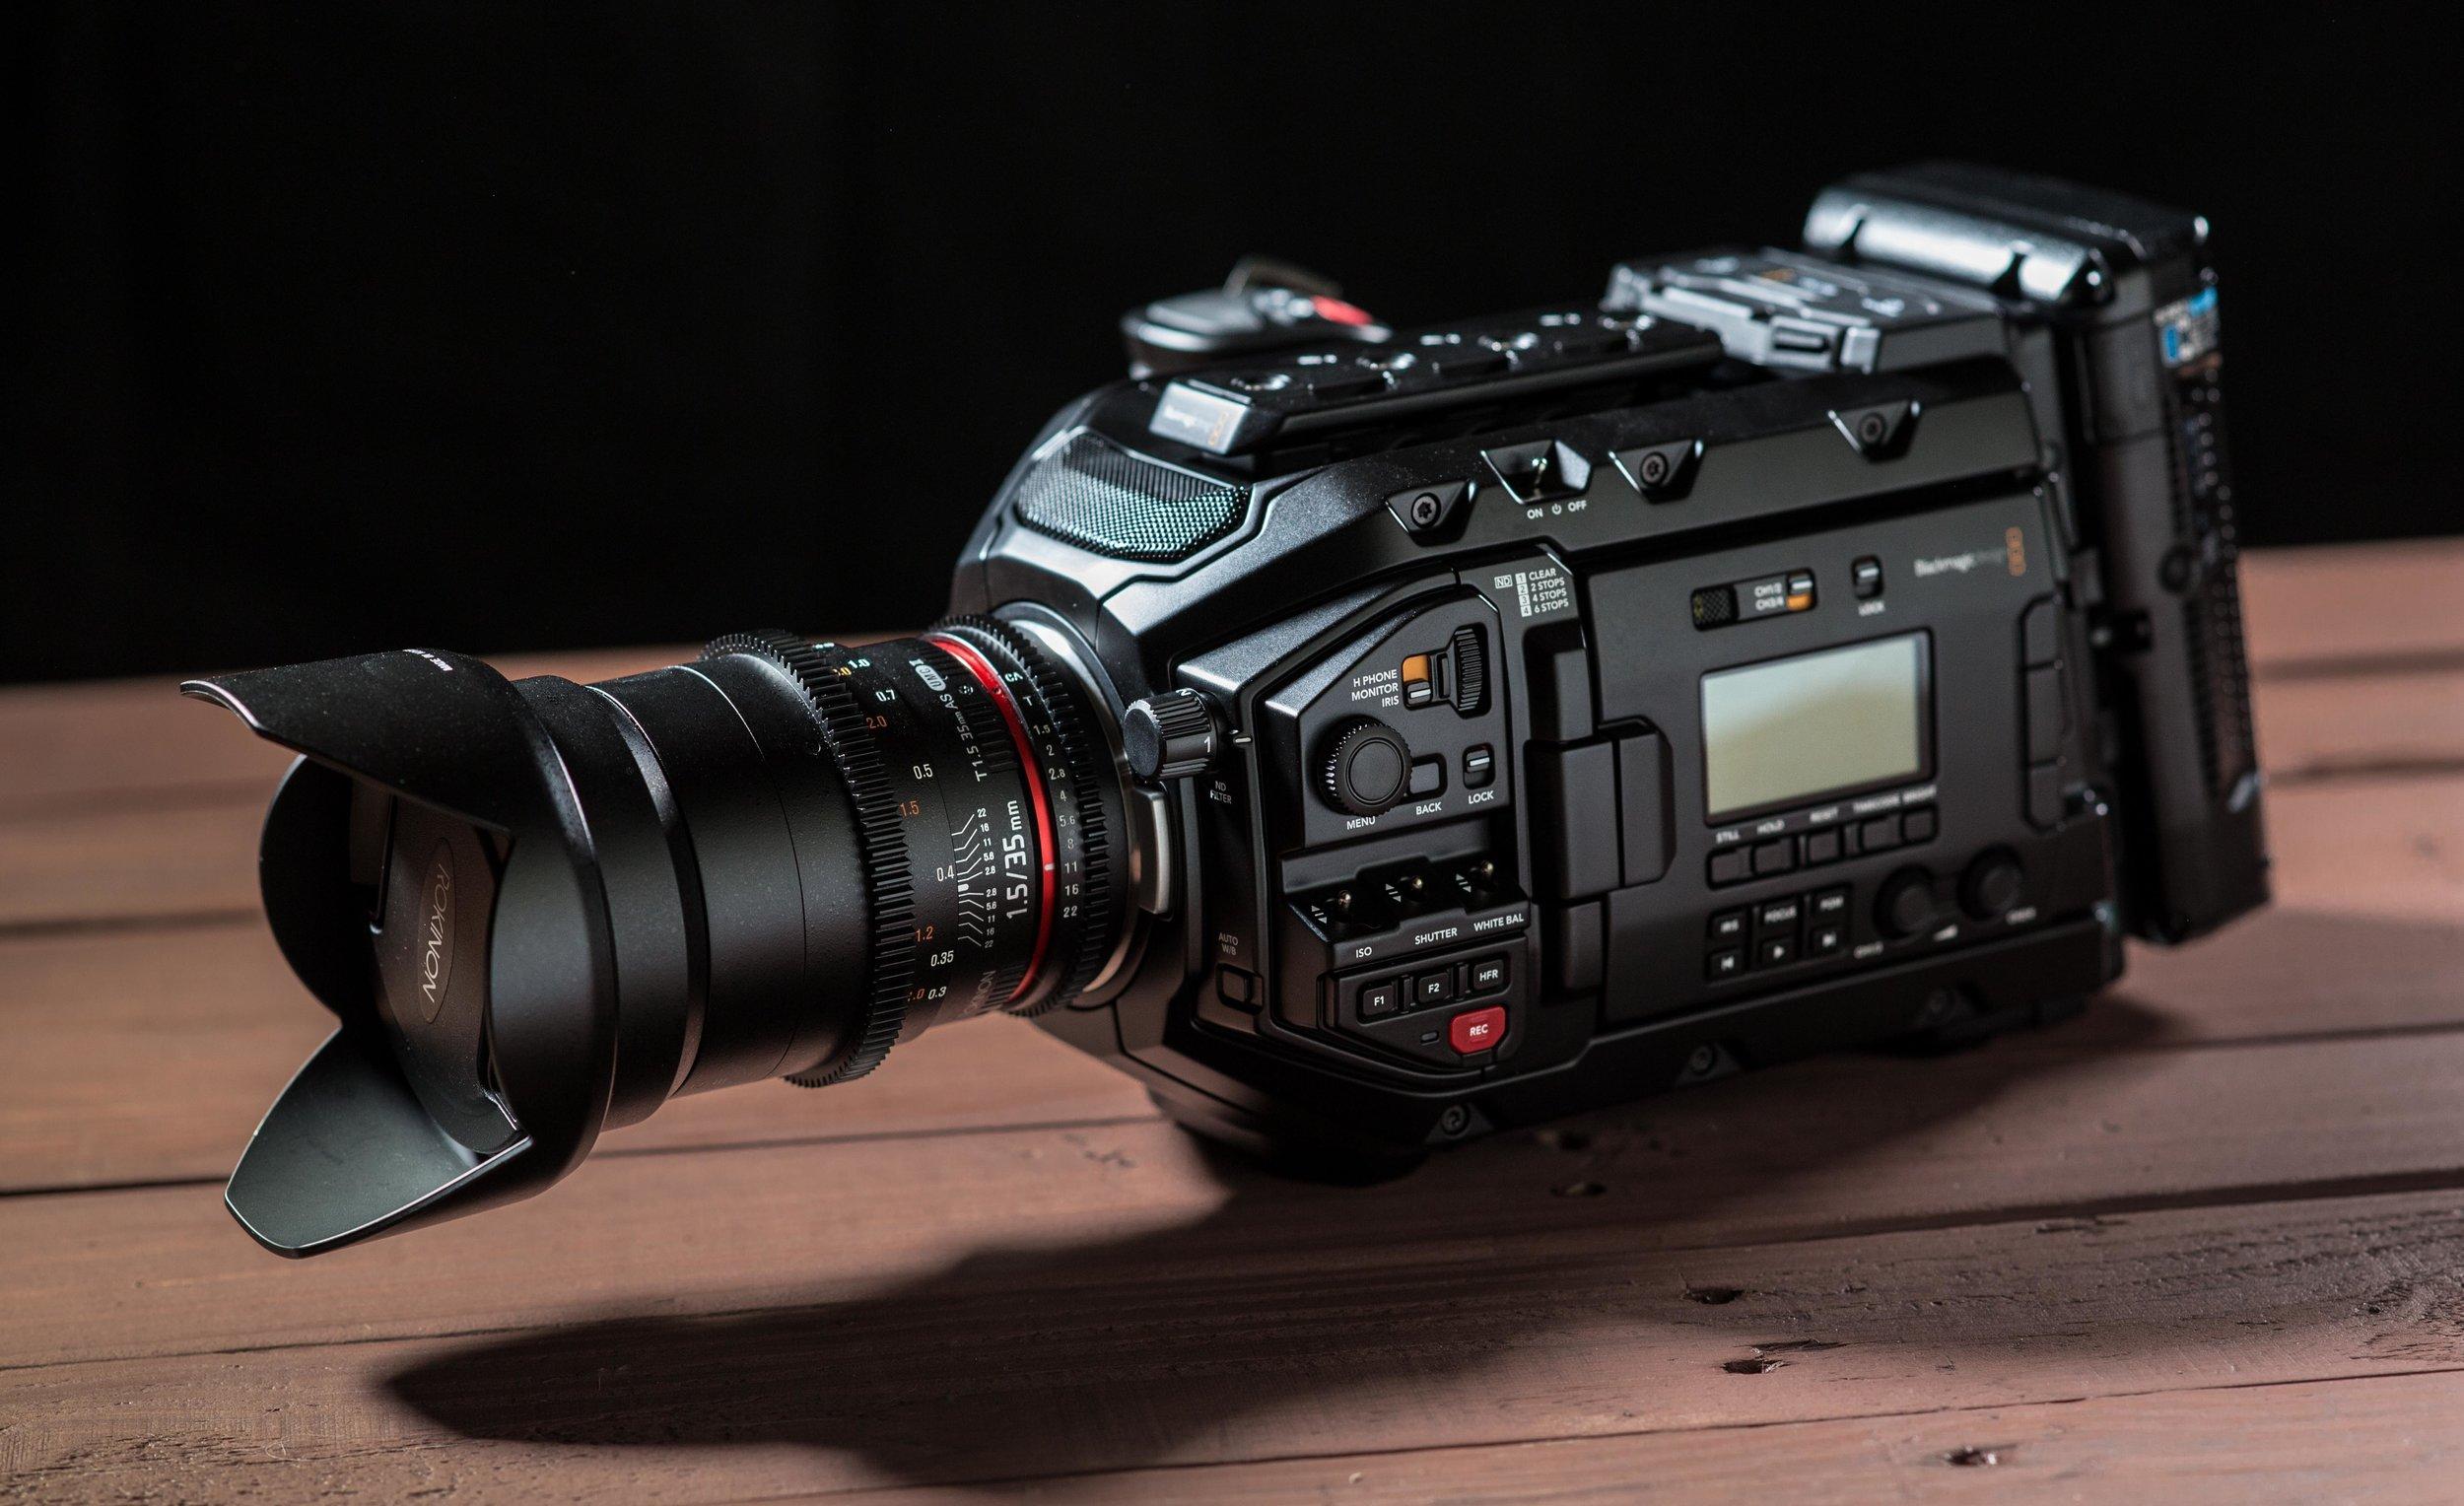 Ursa Mini Pro with Rokinon 35mm